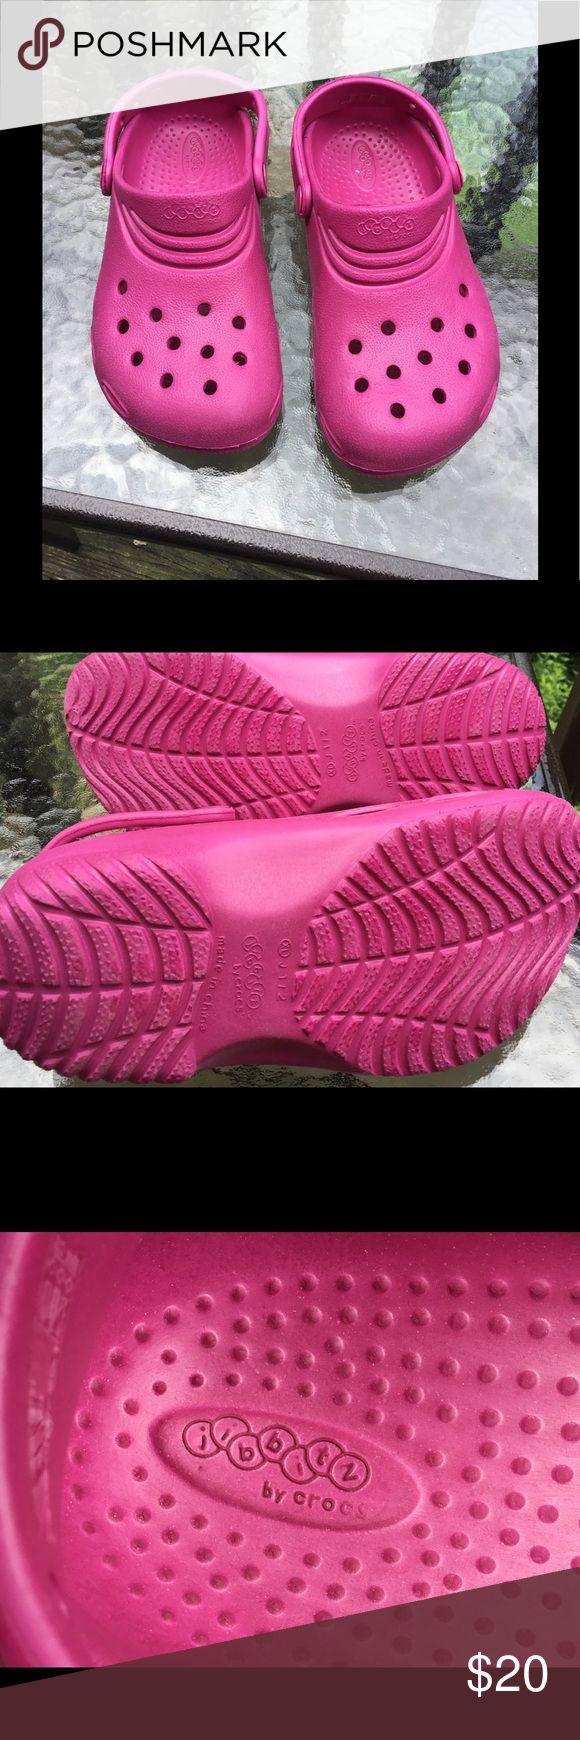 Girls Pink Crocs Size XL Jibbitz by Crocs. Excellent condition. CROCS Shoes Water Shoes